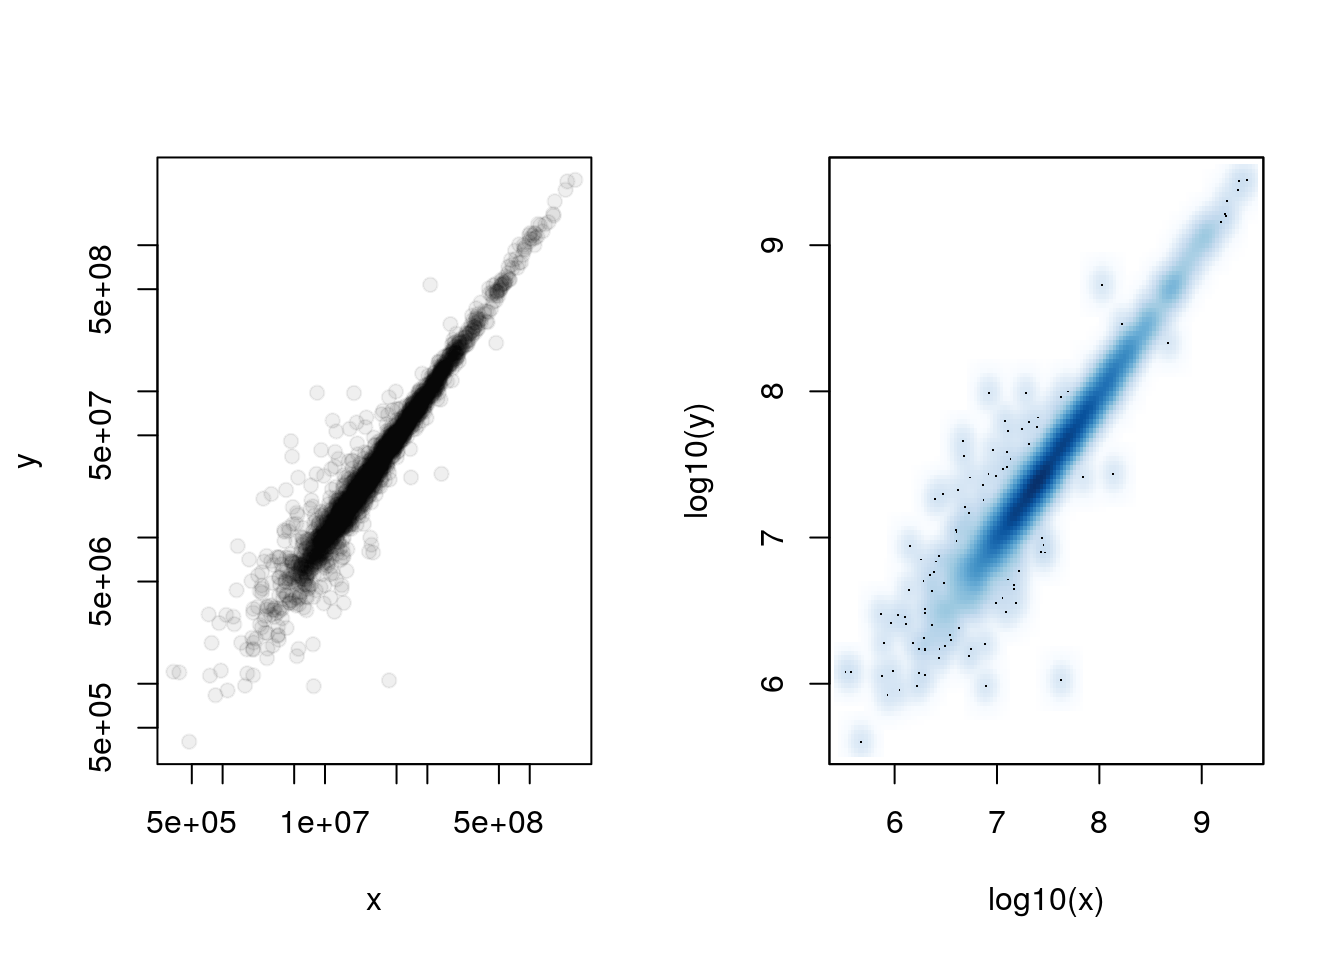 Chapter 6 Tools and plots | Visualisation of biomolecular data